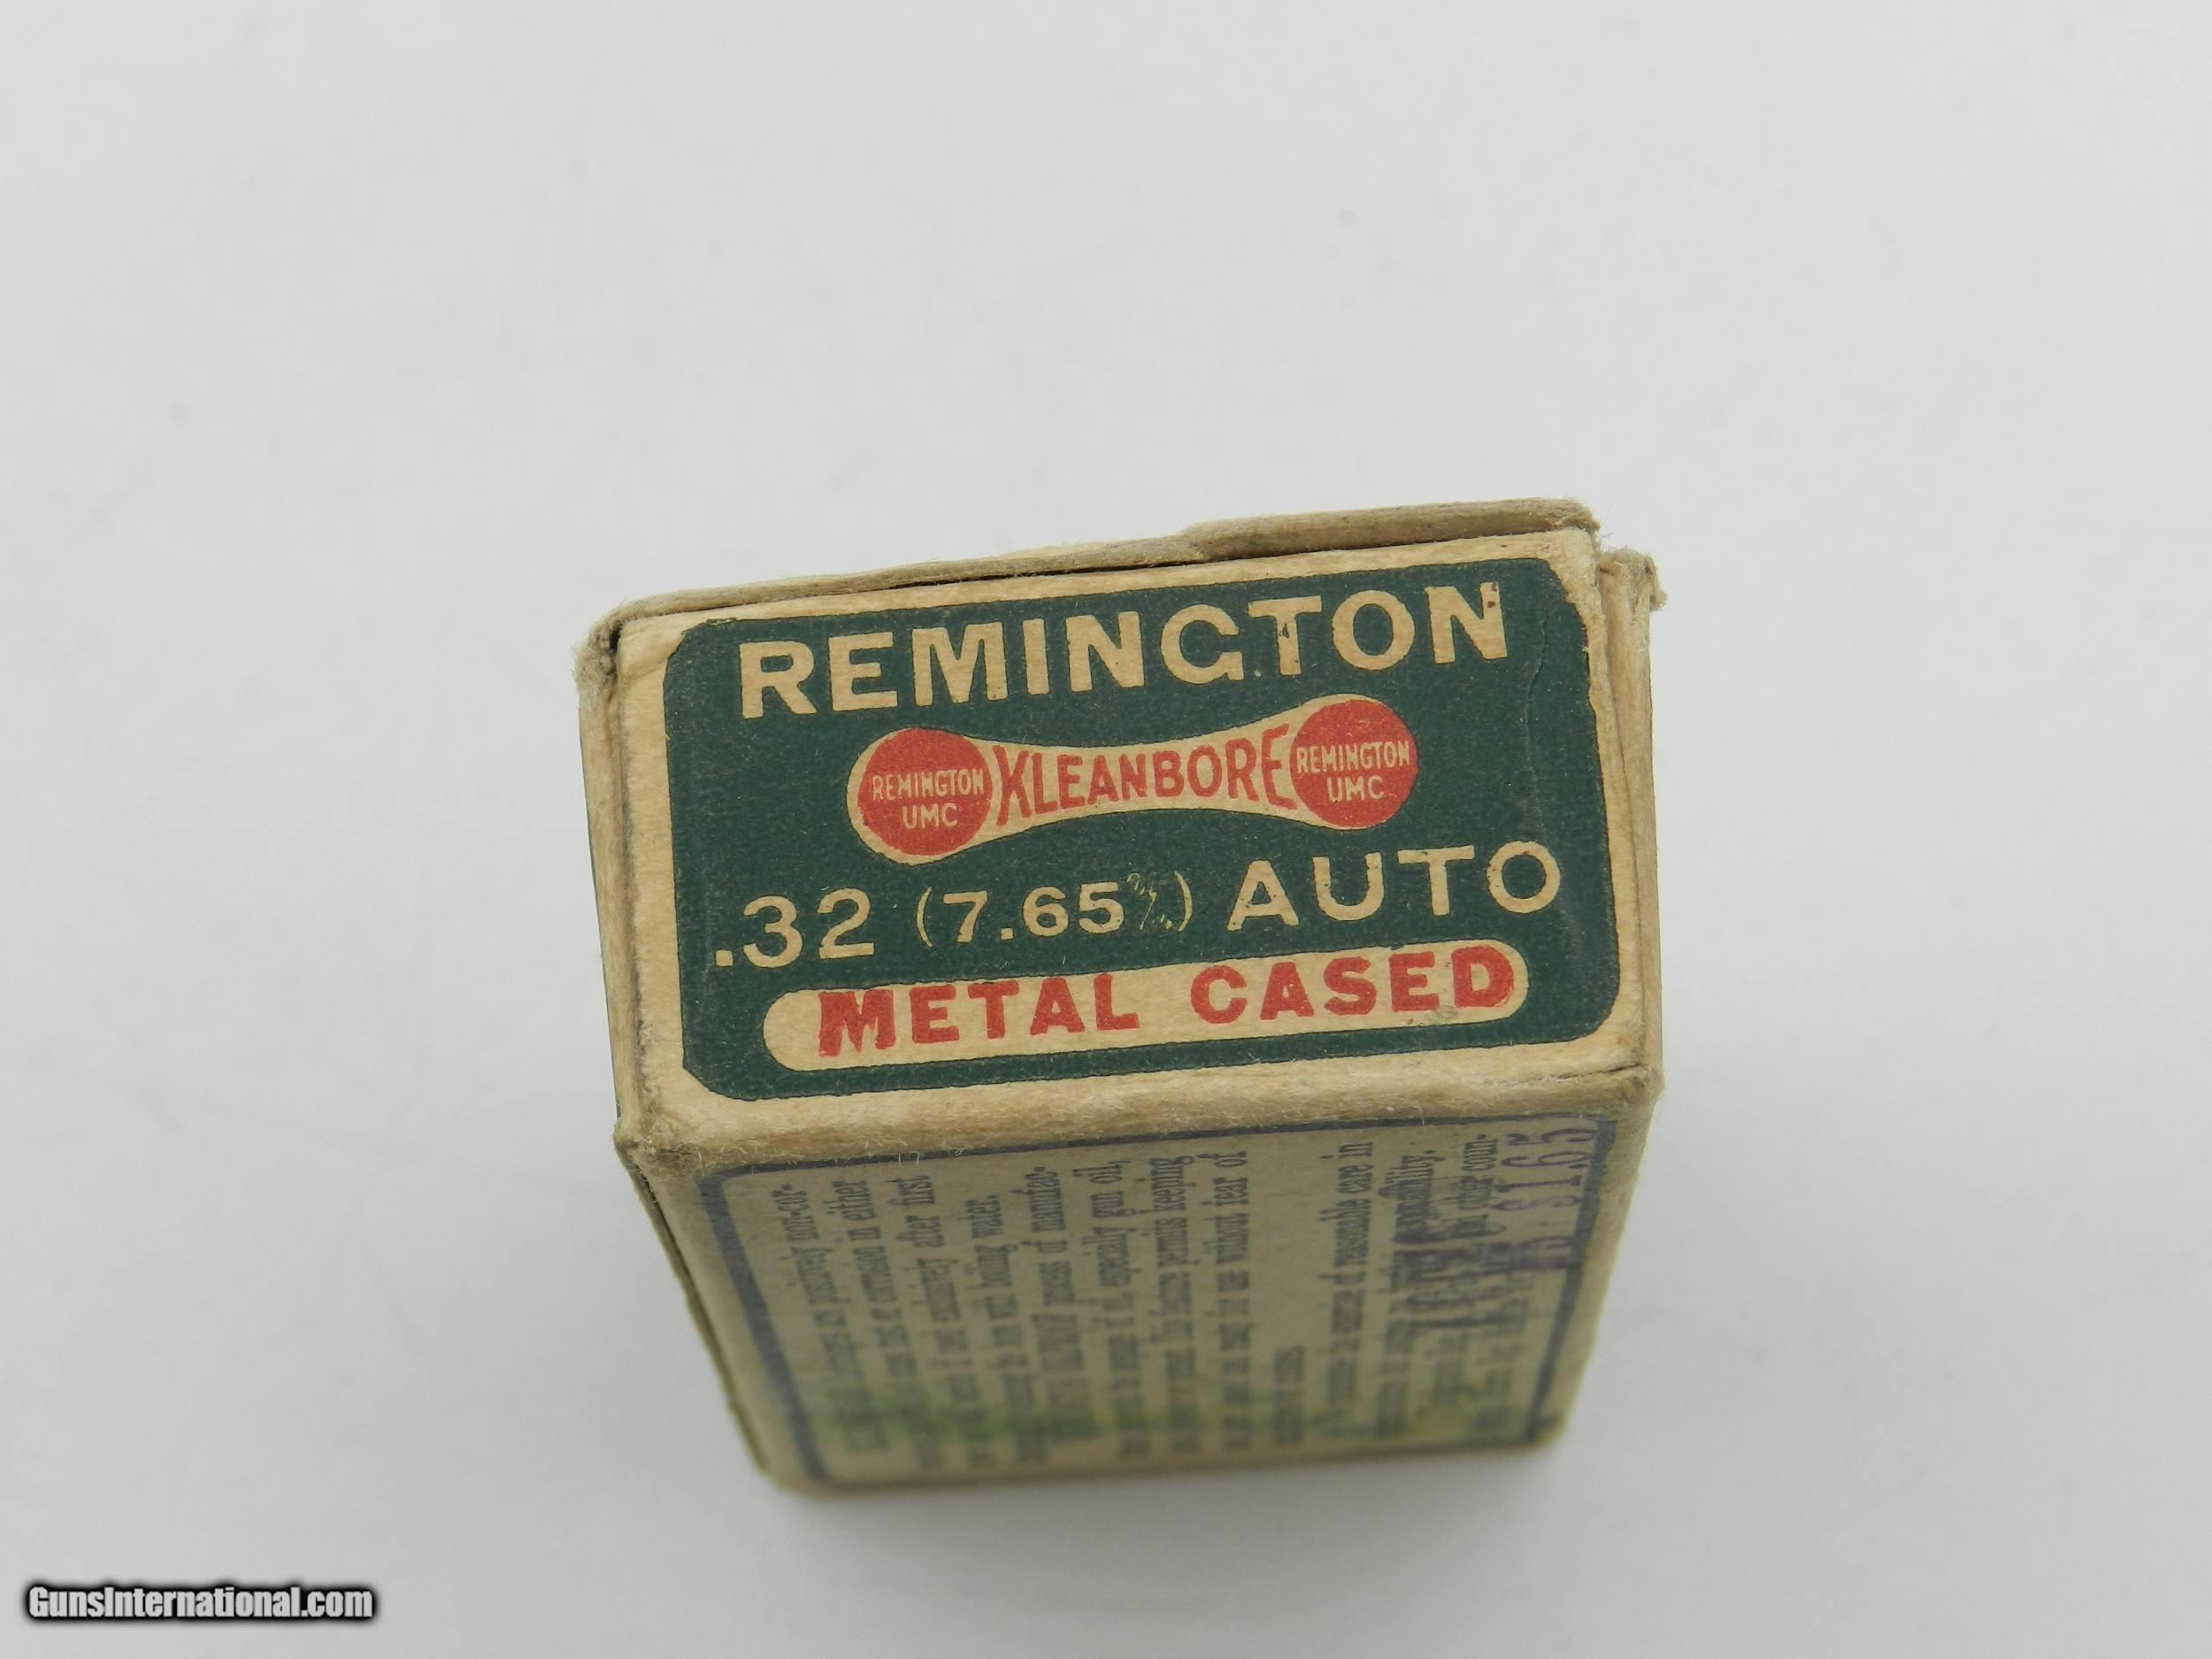 Collectible Ammo: Remington Kleanbore  32 Auto (7 65 mm), 71 grain